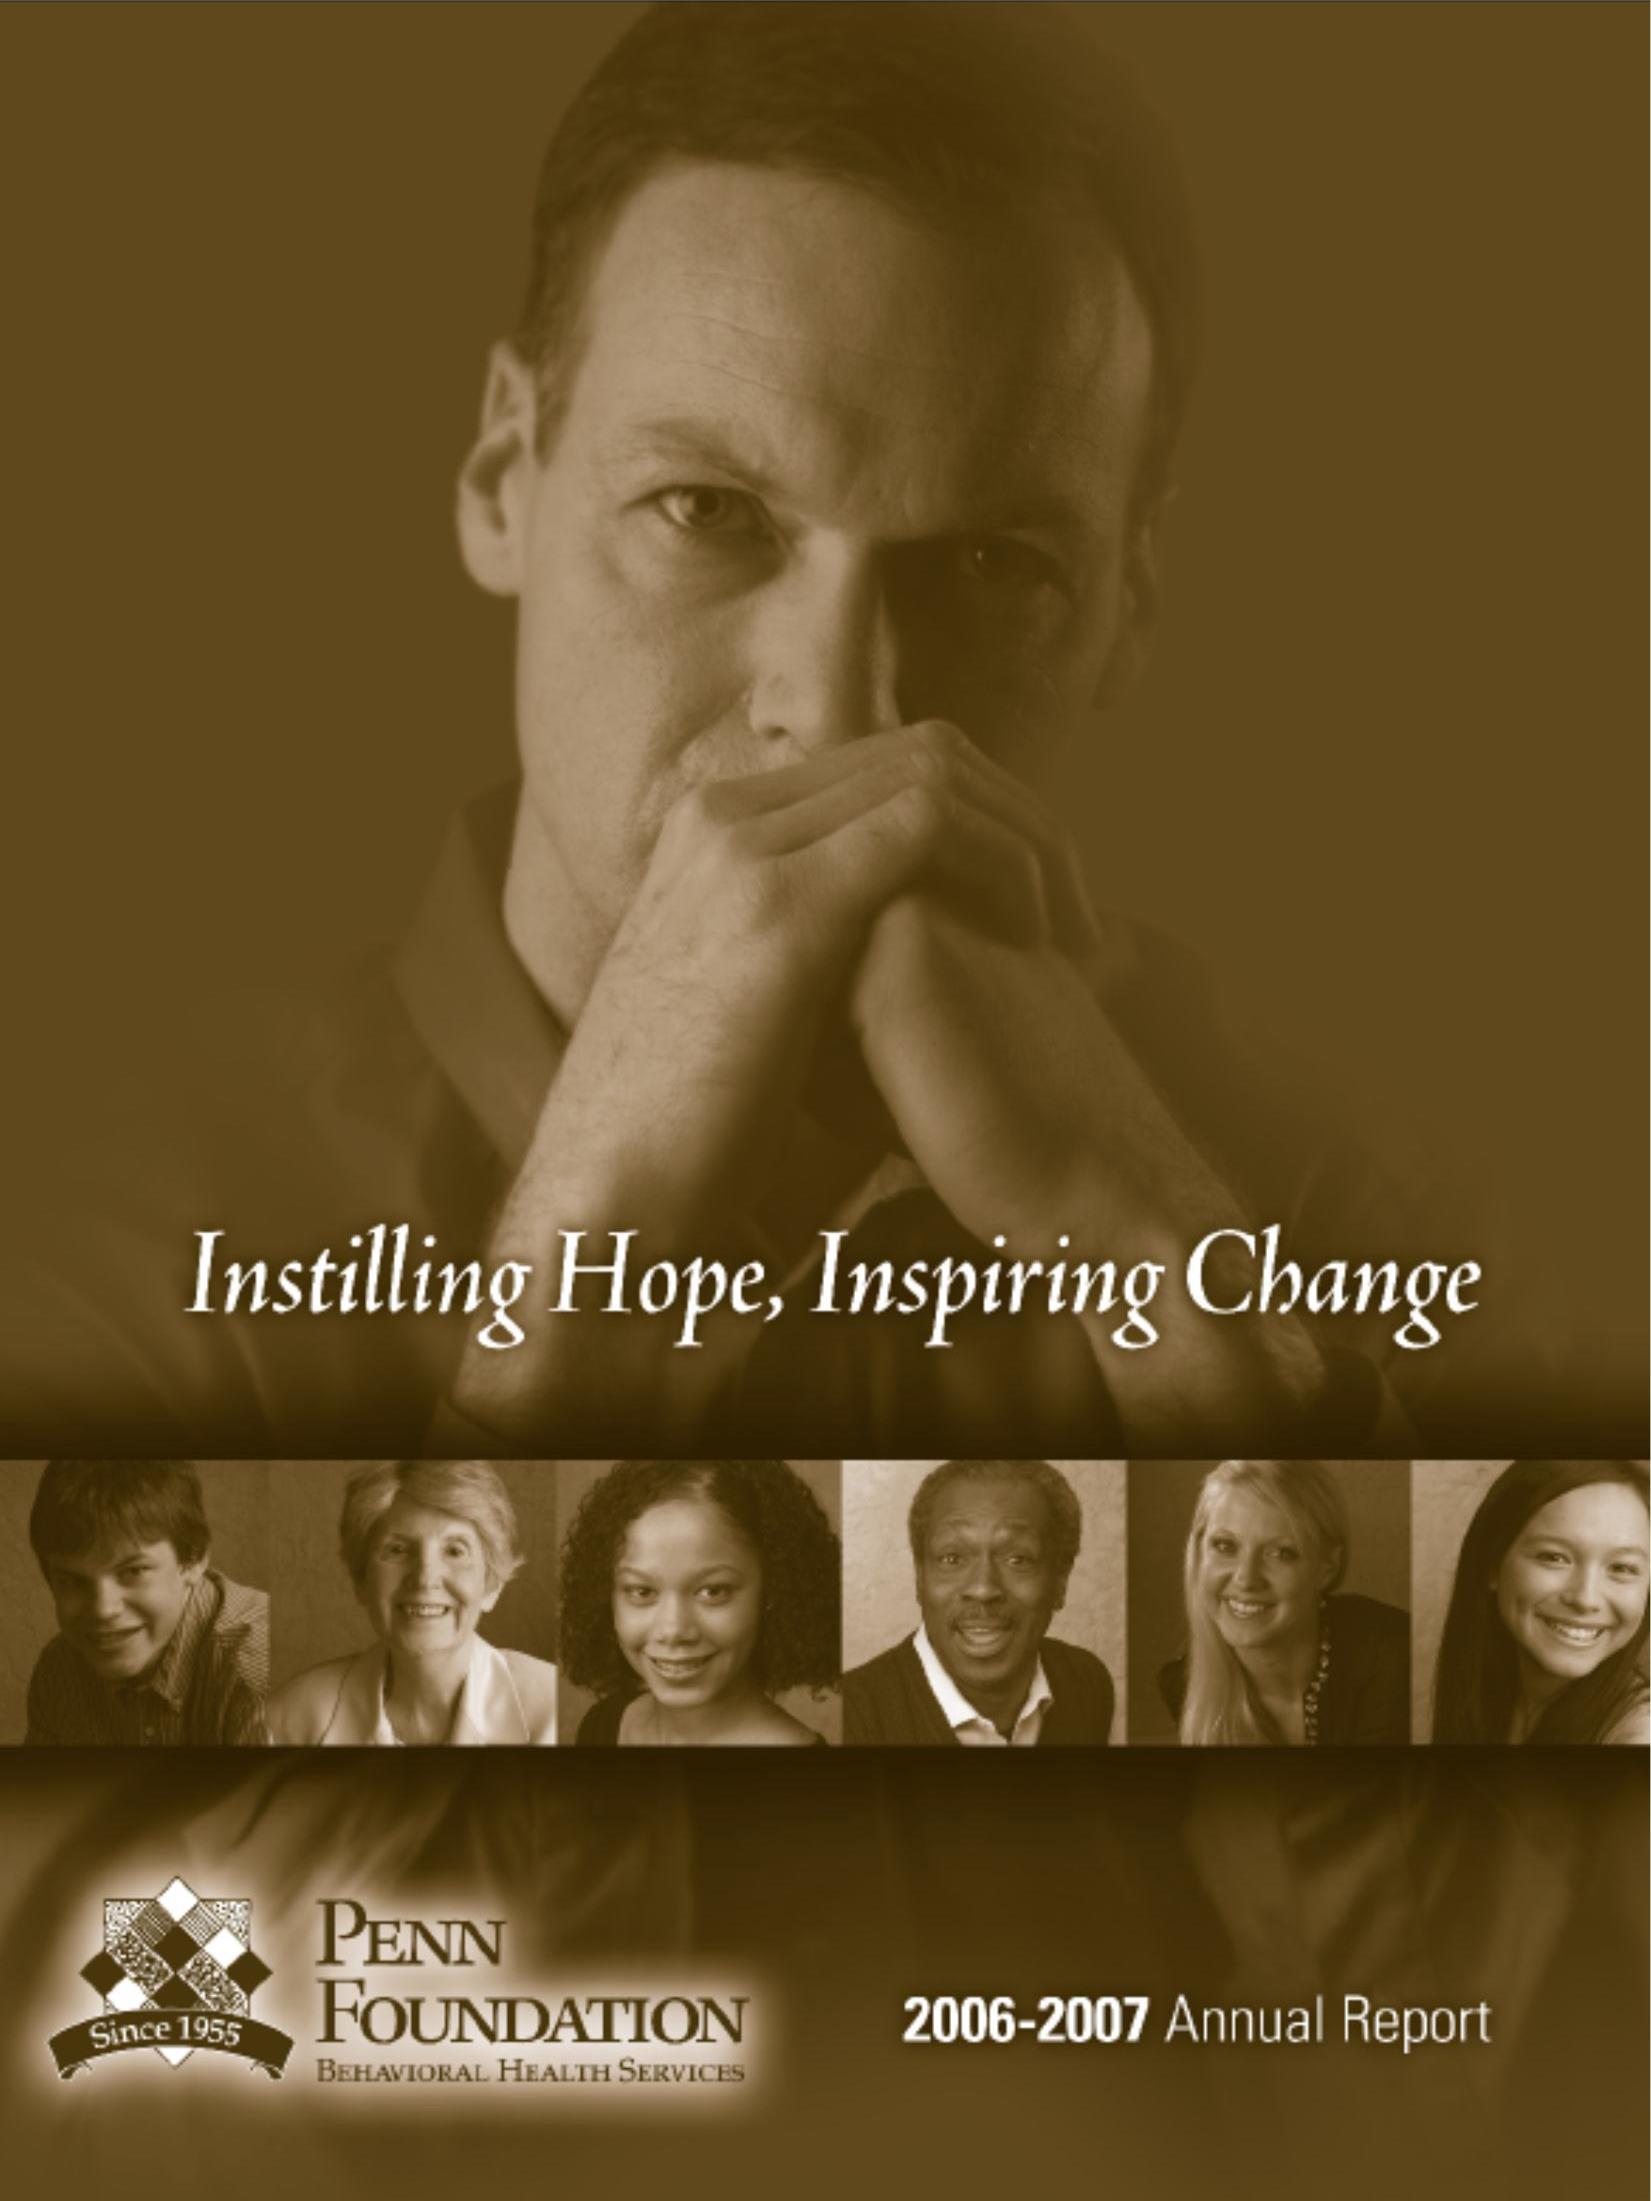 2007 Annual Report Cover